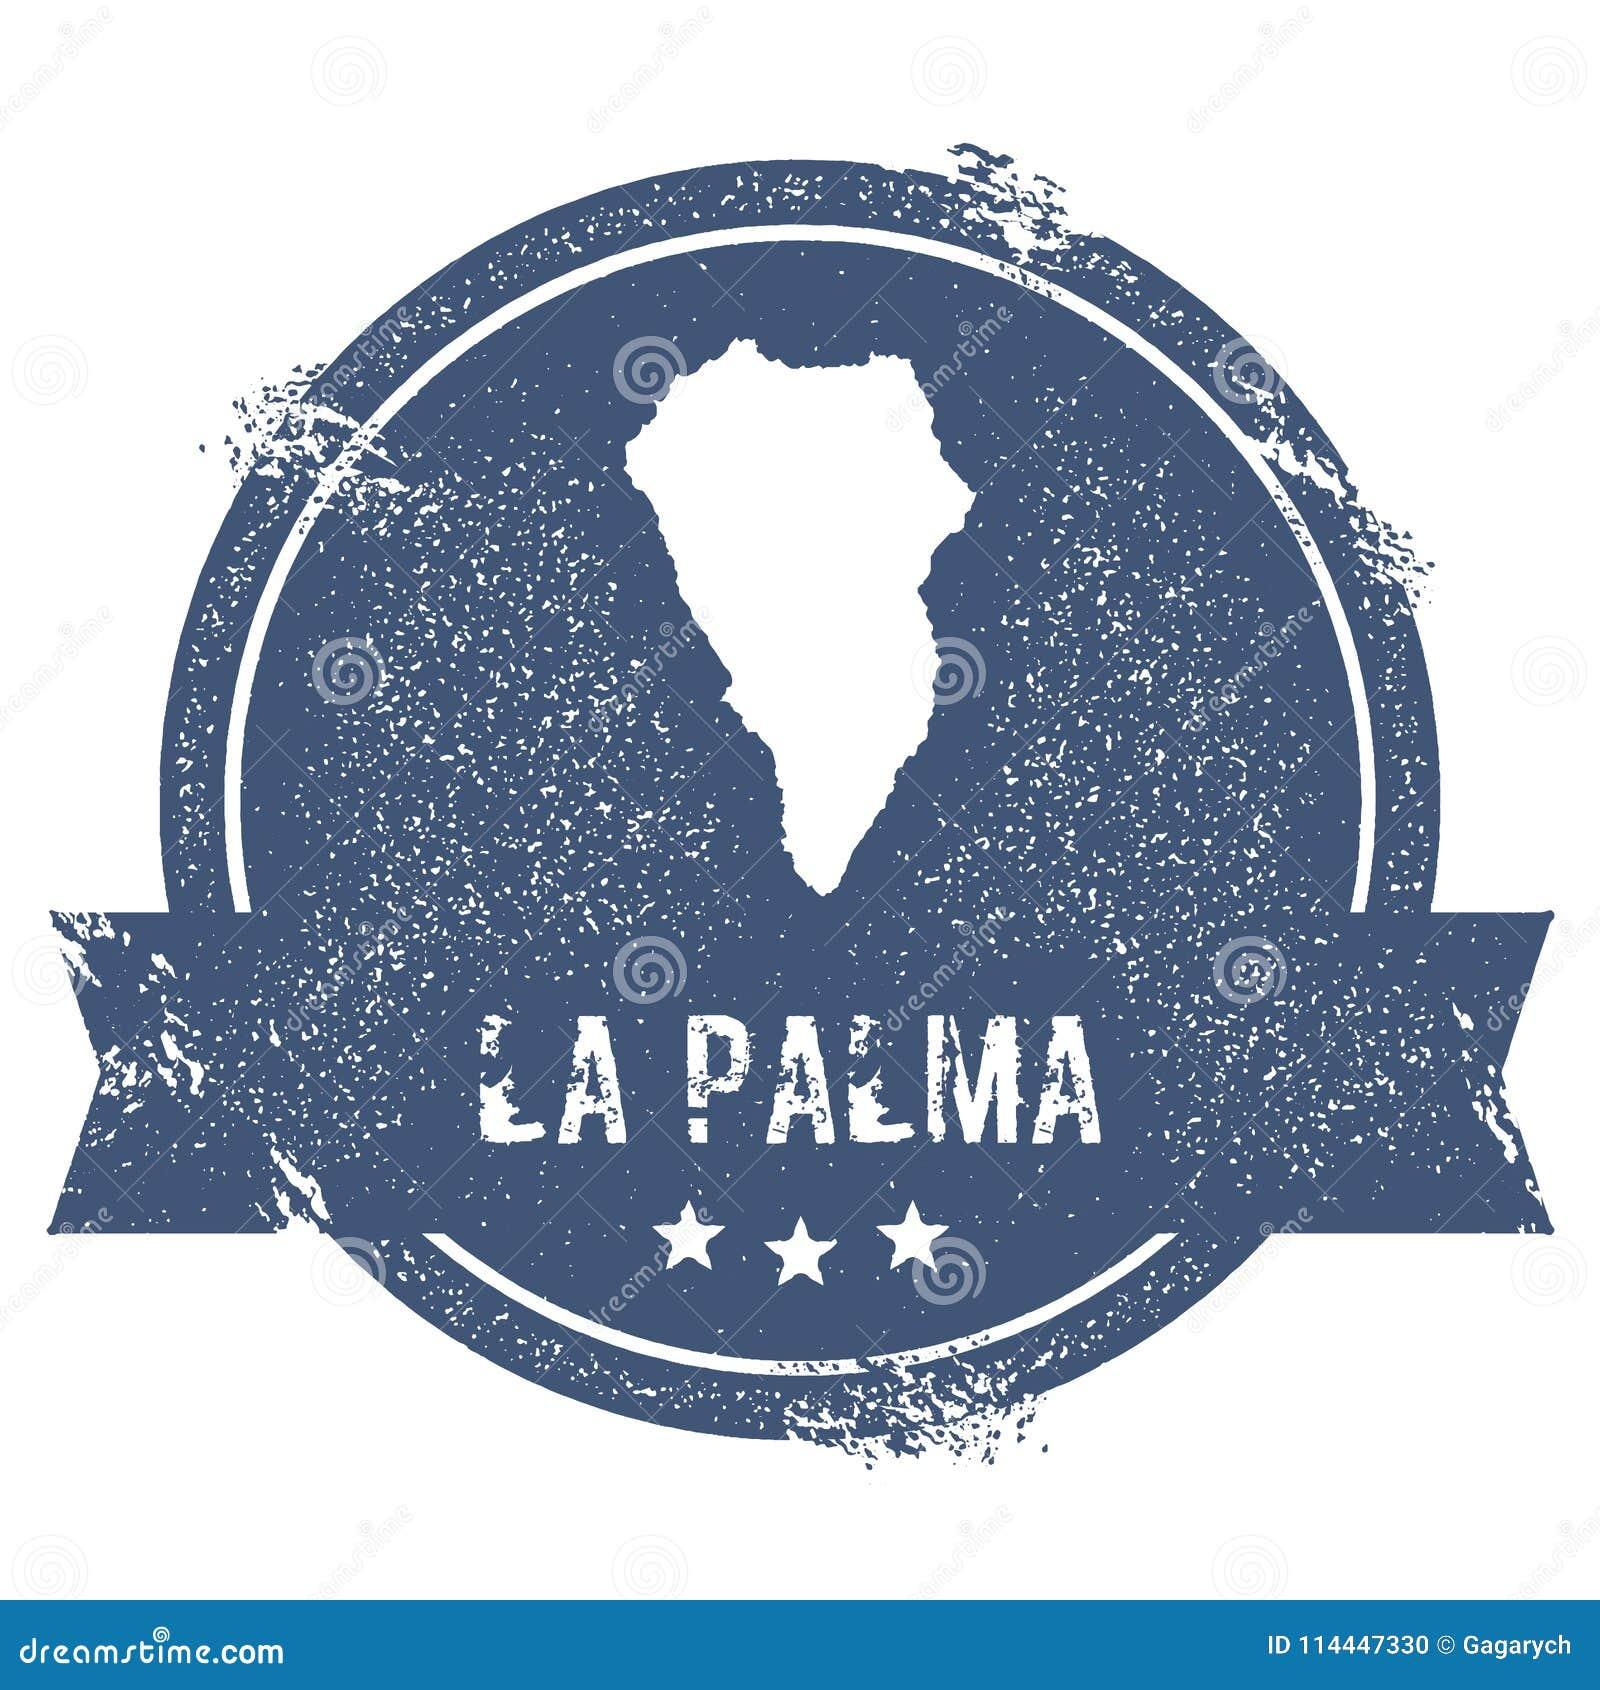 La Palma logo sign. stock vector. Illustration of star - 114447330